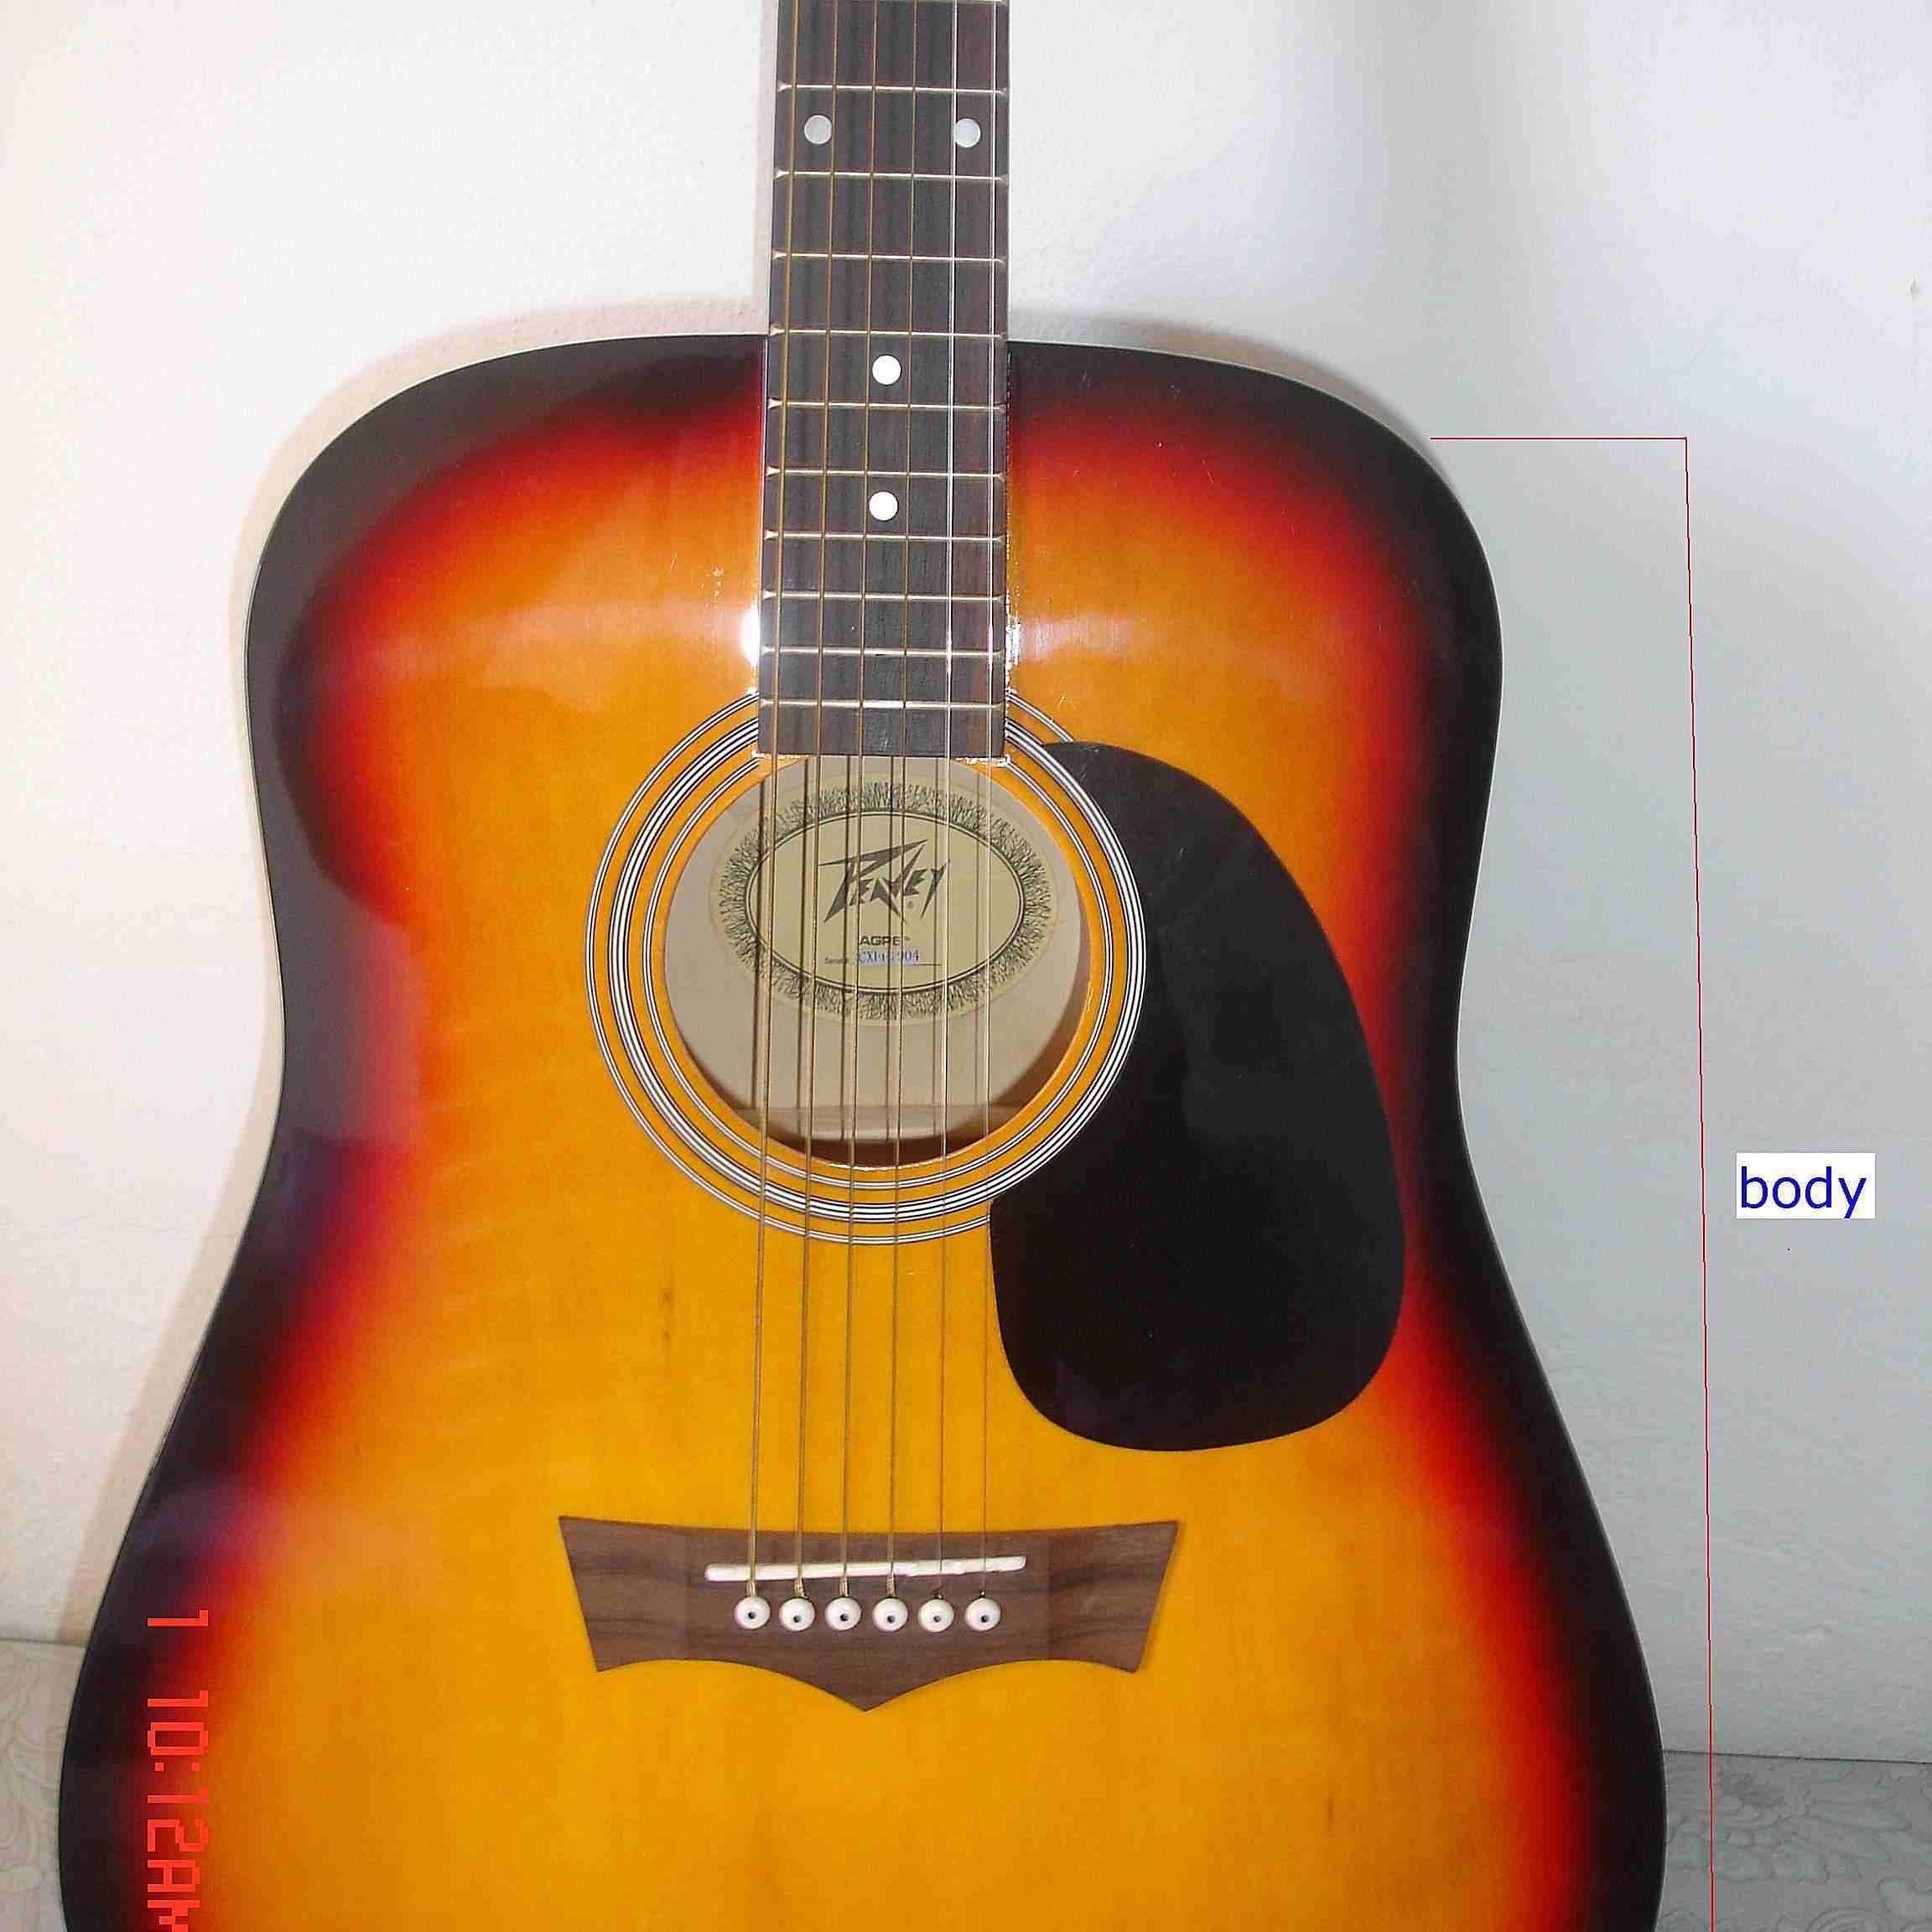 Guitar Parts Diagram Acoustic In 2020 Guitar Guitar Parts Acoustic